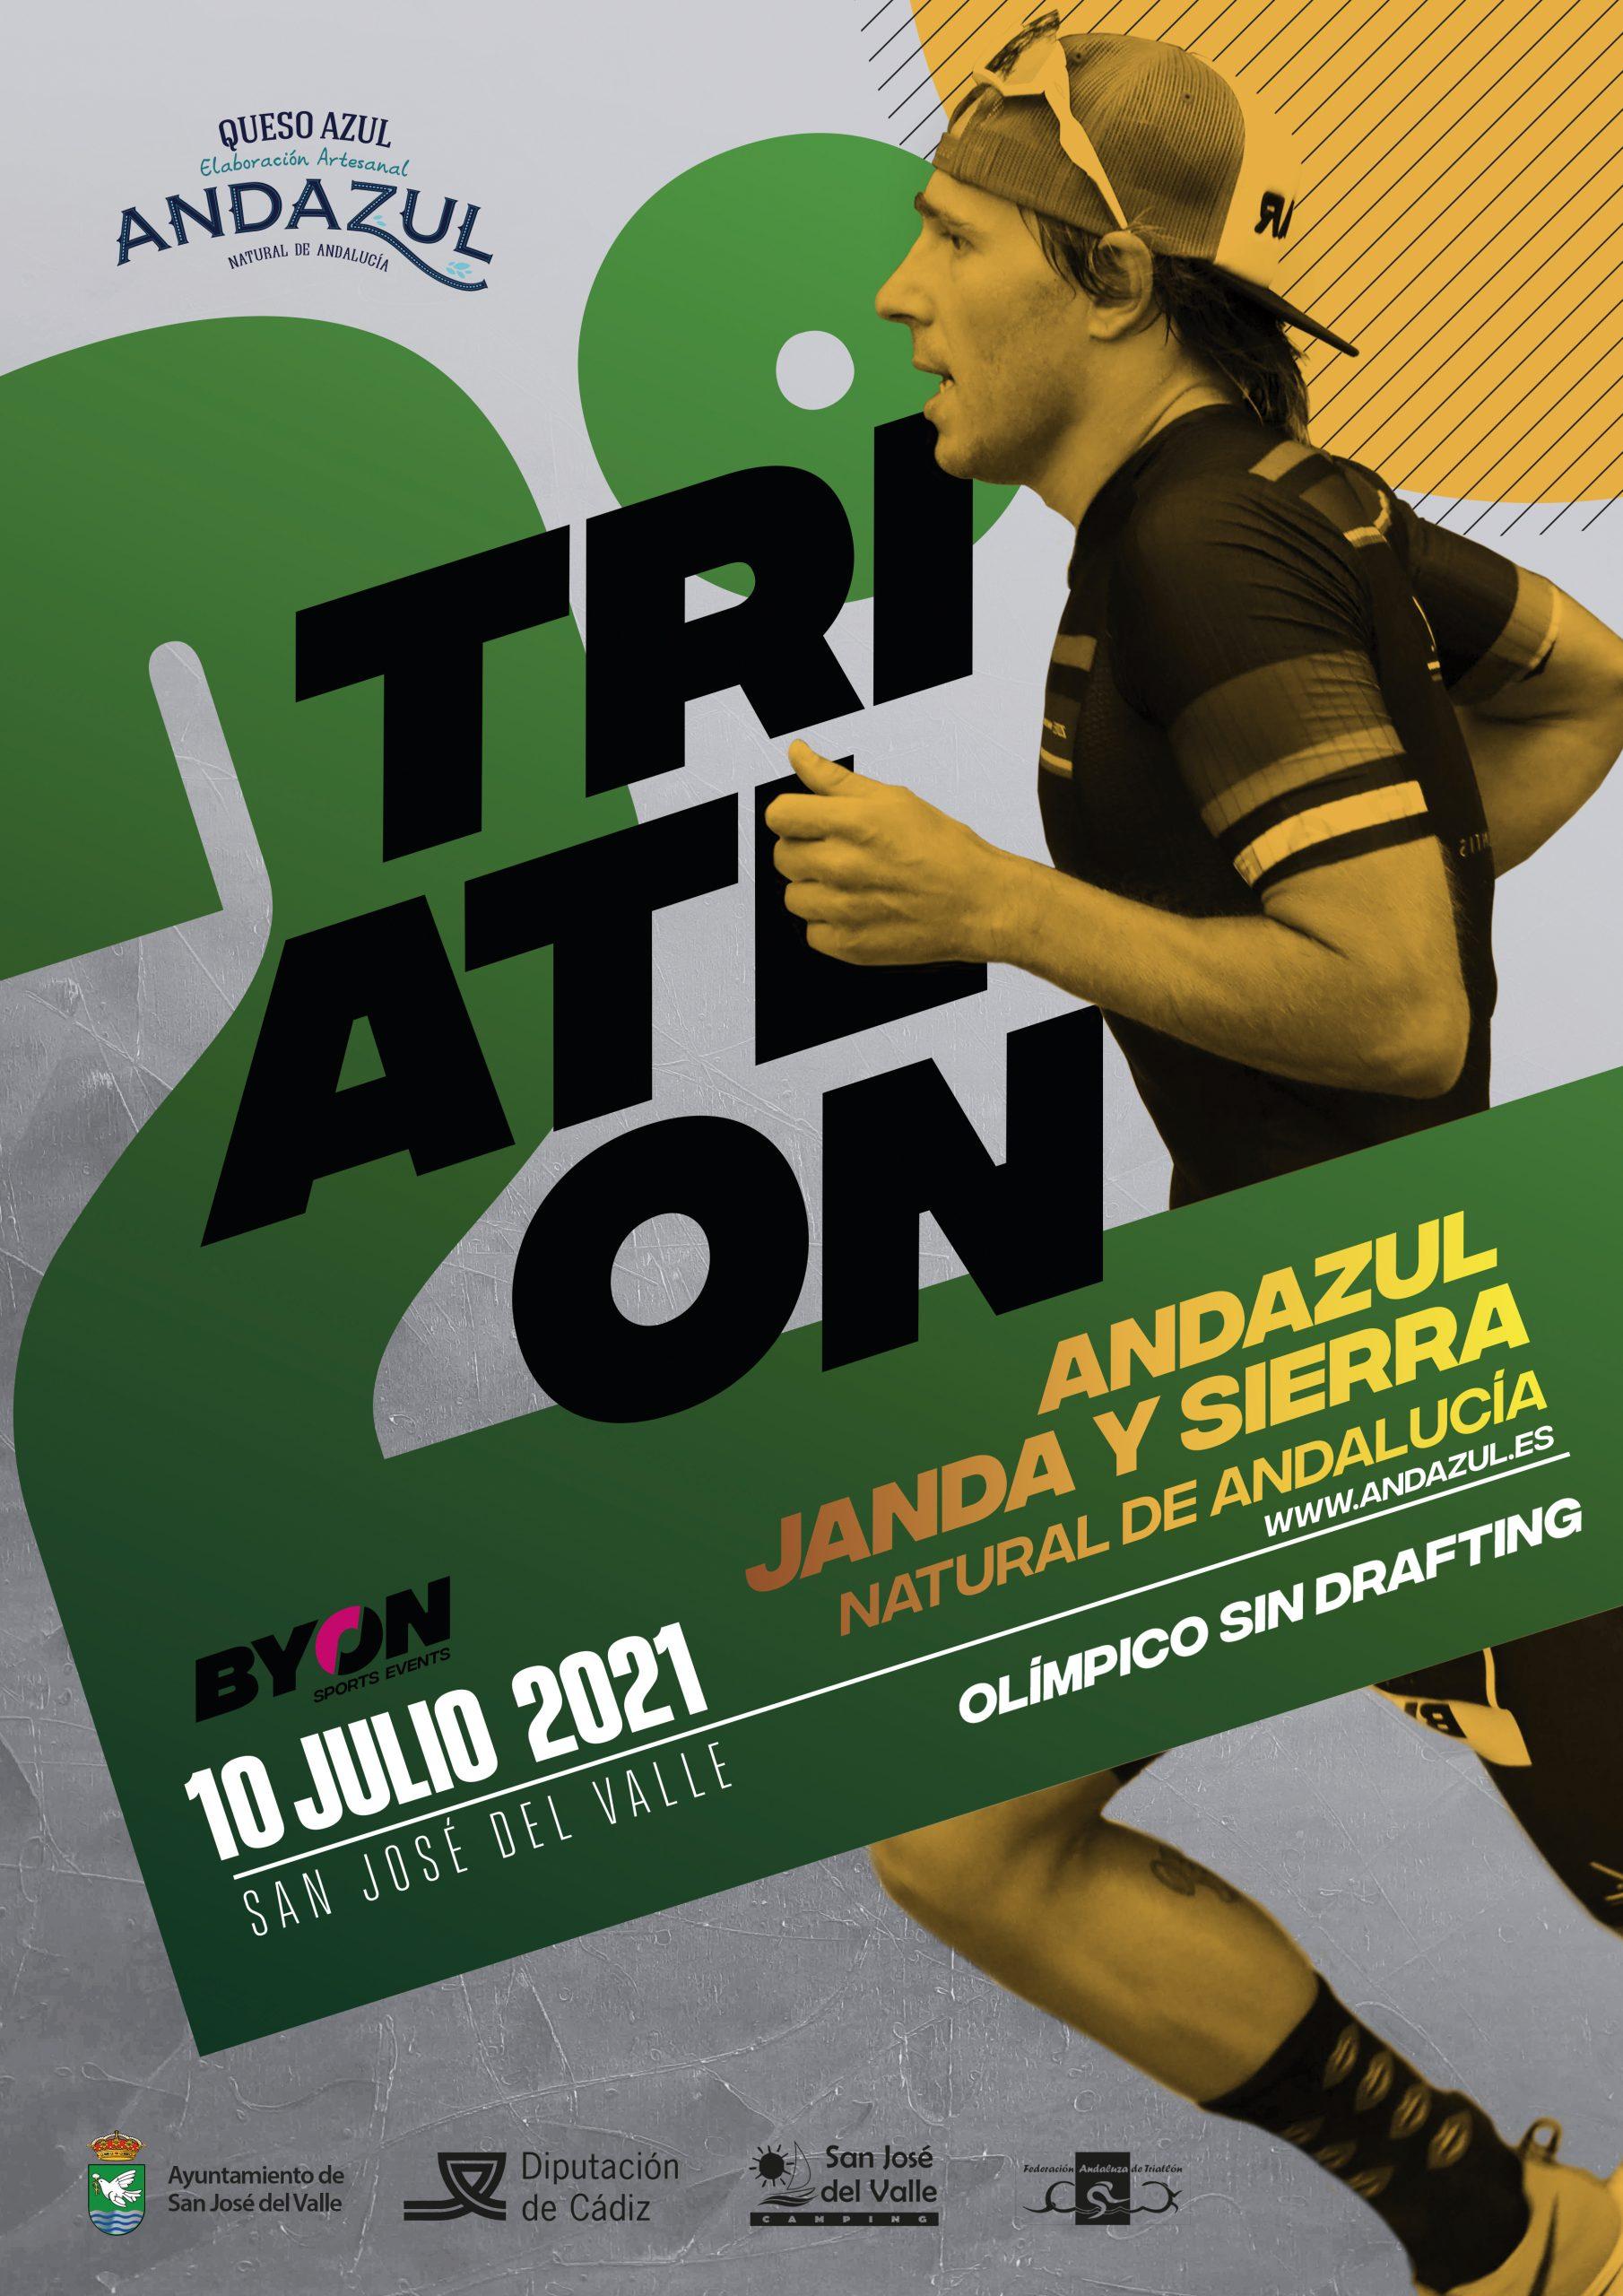 II TRIATLON JANDA Y SIERRA OLIMPICO FEMENINO